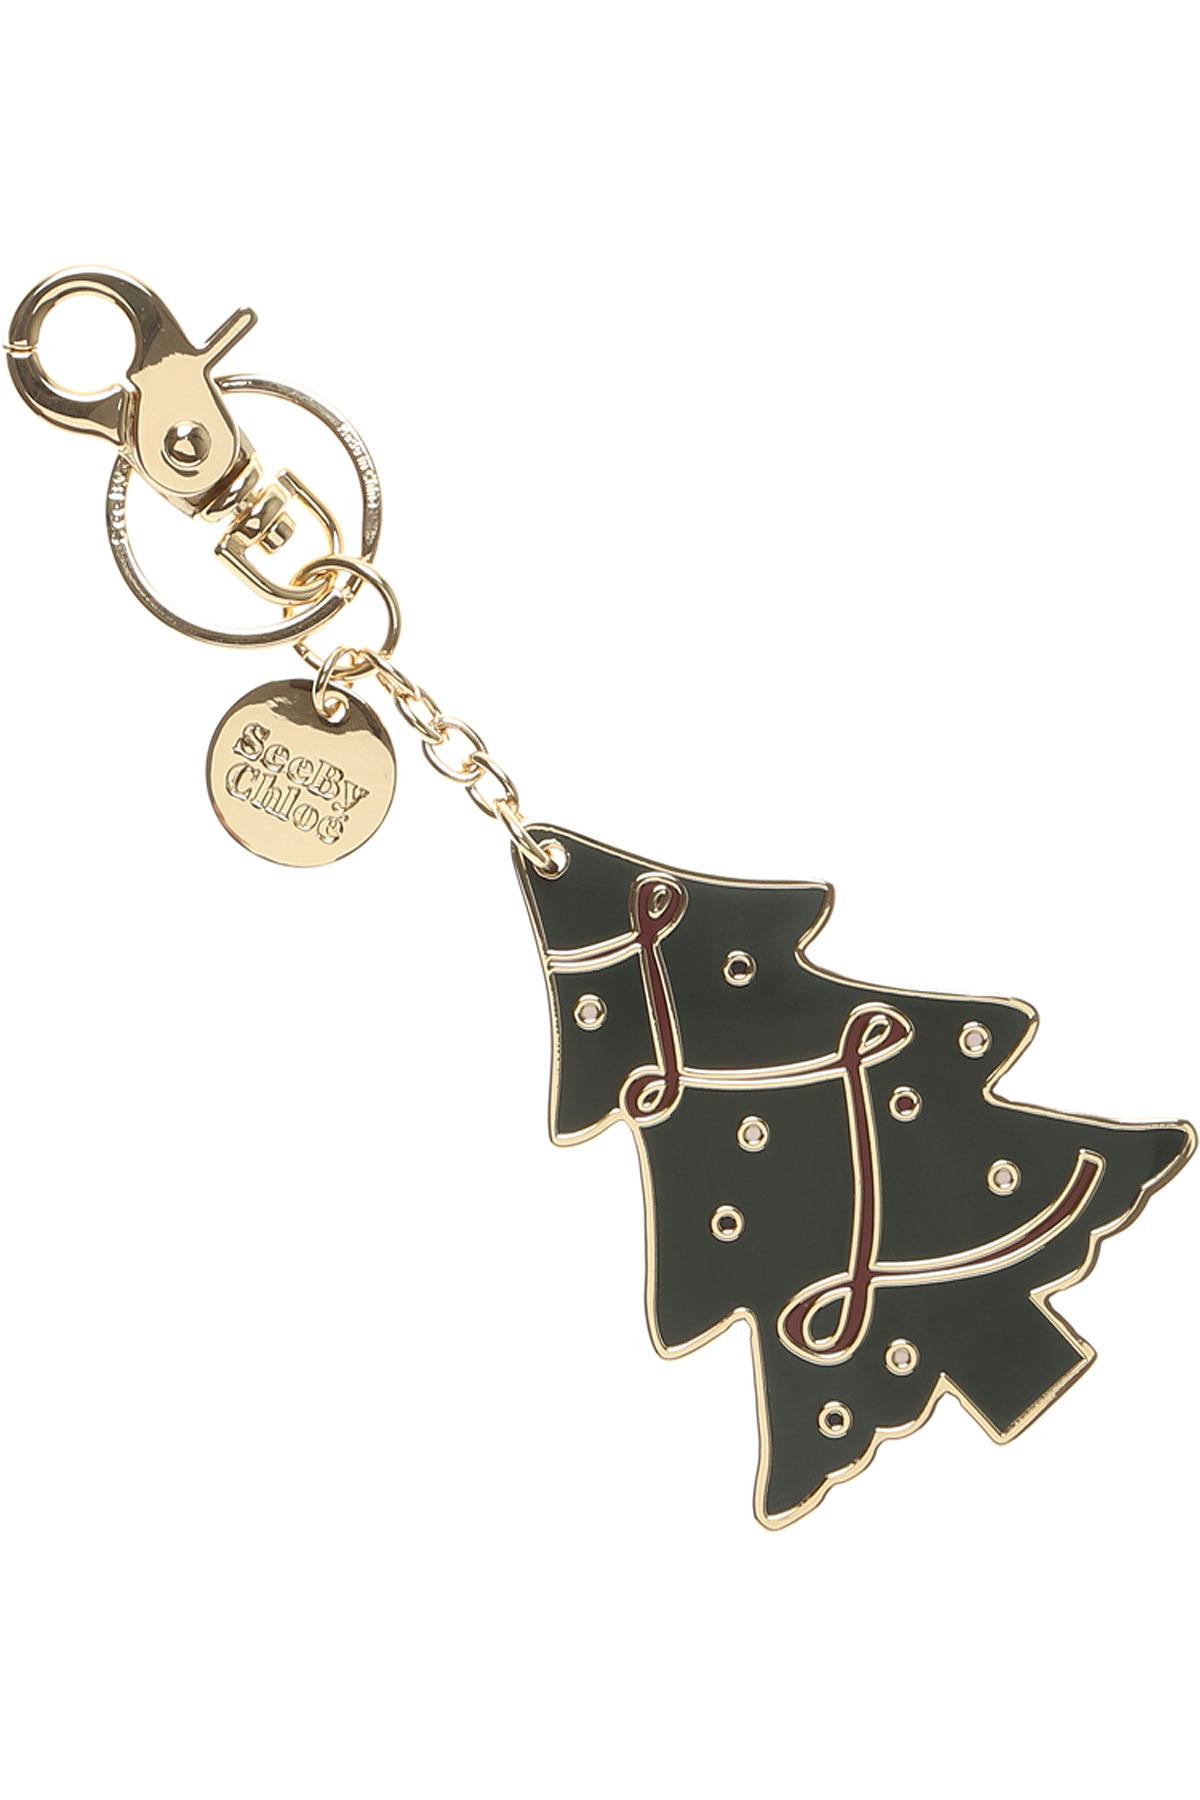 Image of Chloe Key Chain for Women, Key Ring, Gold, 2017